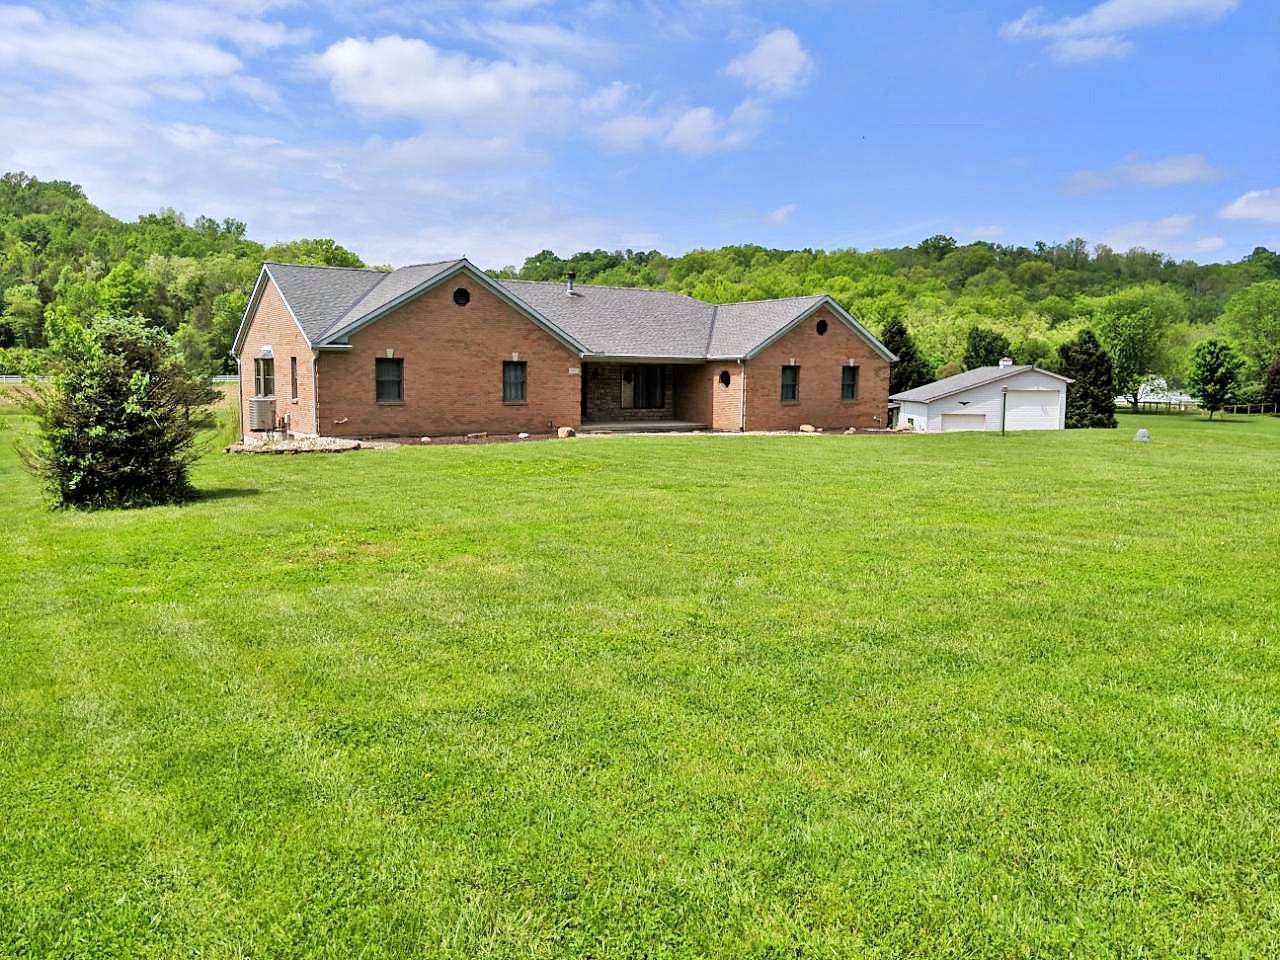 Property for sale at 3955 St Rt 222, Batavia Twp,  Ohio 45103